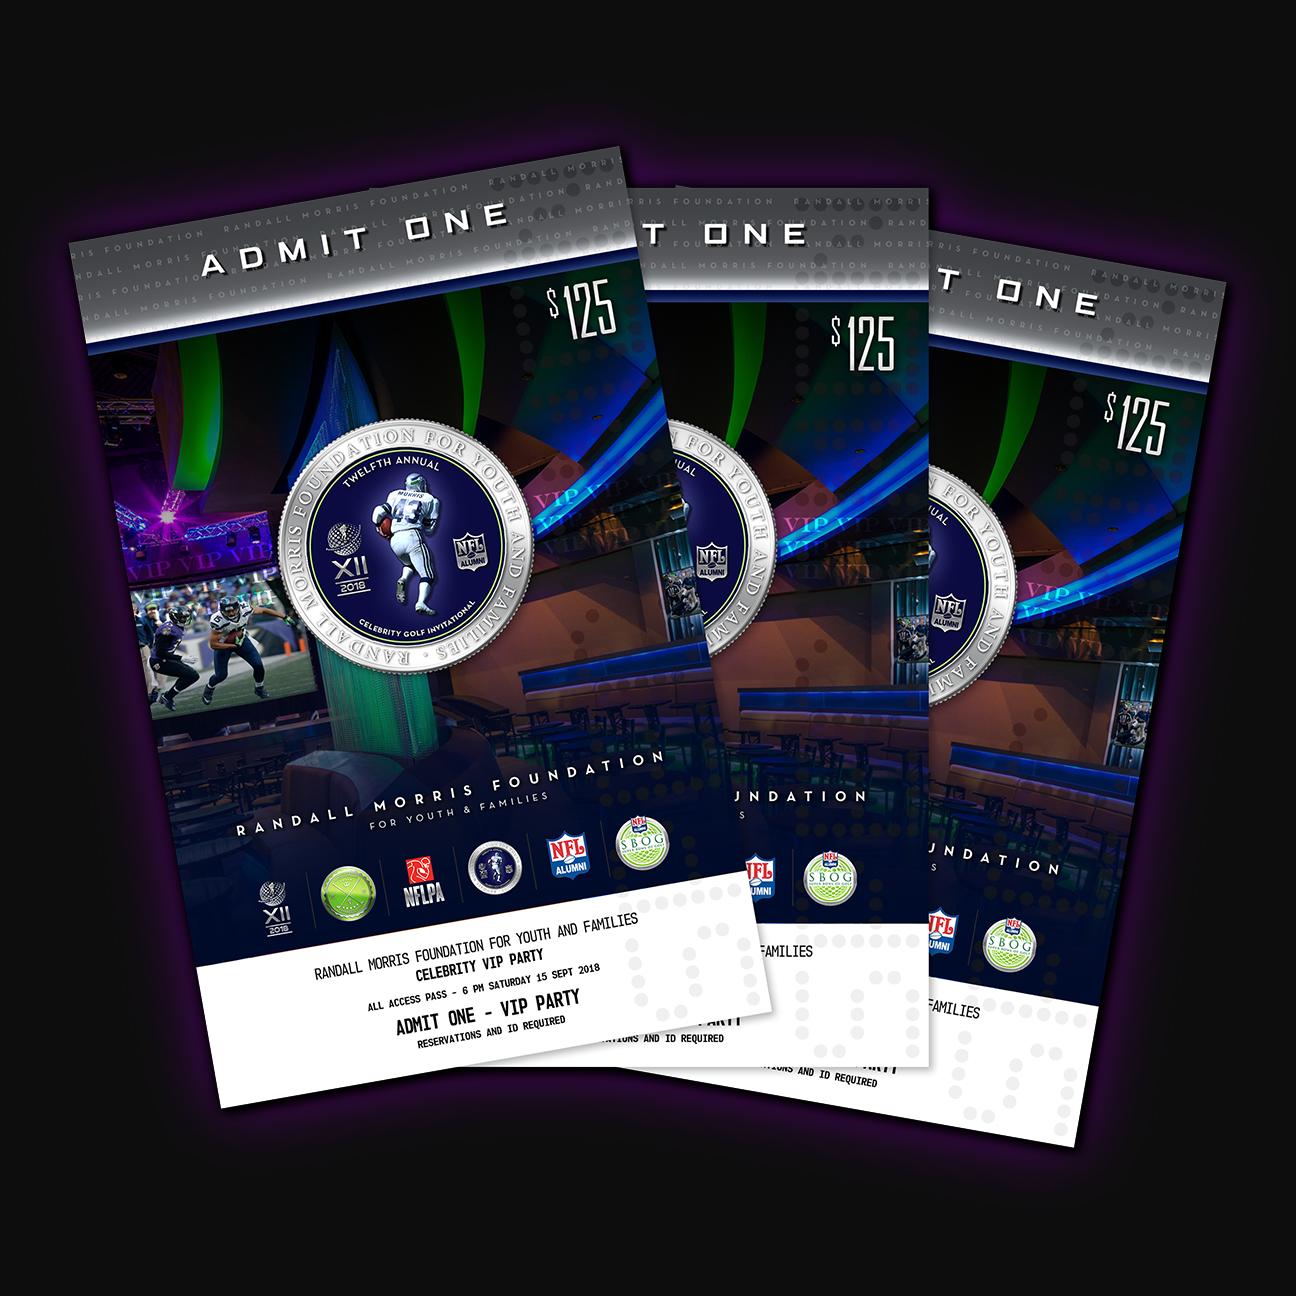 Randall Morris Foundation VIP Tickets [v3 web web web] Fanned by Graham Hnedak Brand G Creative 09 SEPT 2018.jpg